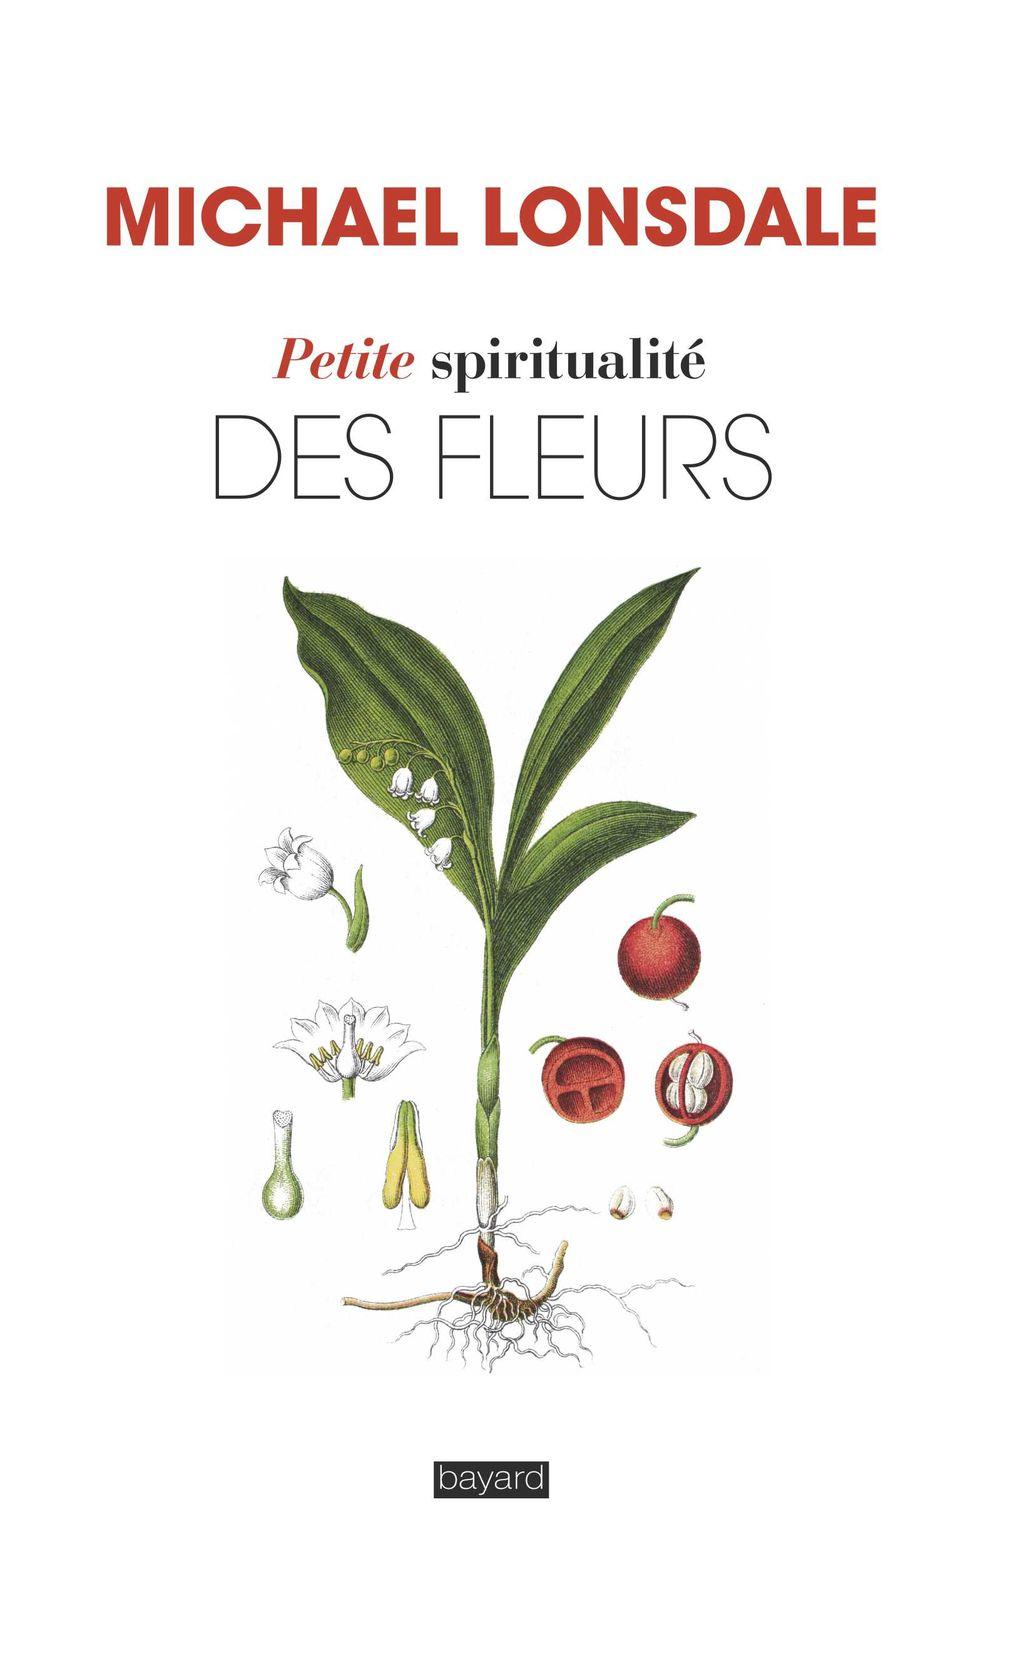 «Petite spiritualité des fleurs» cover